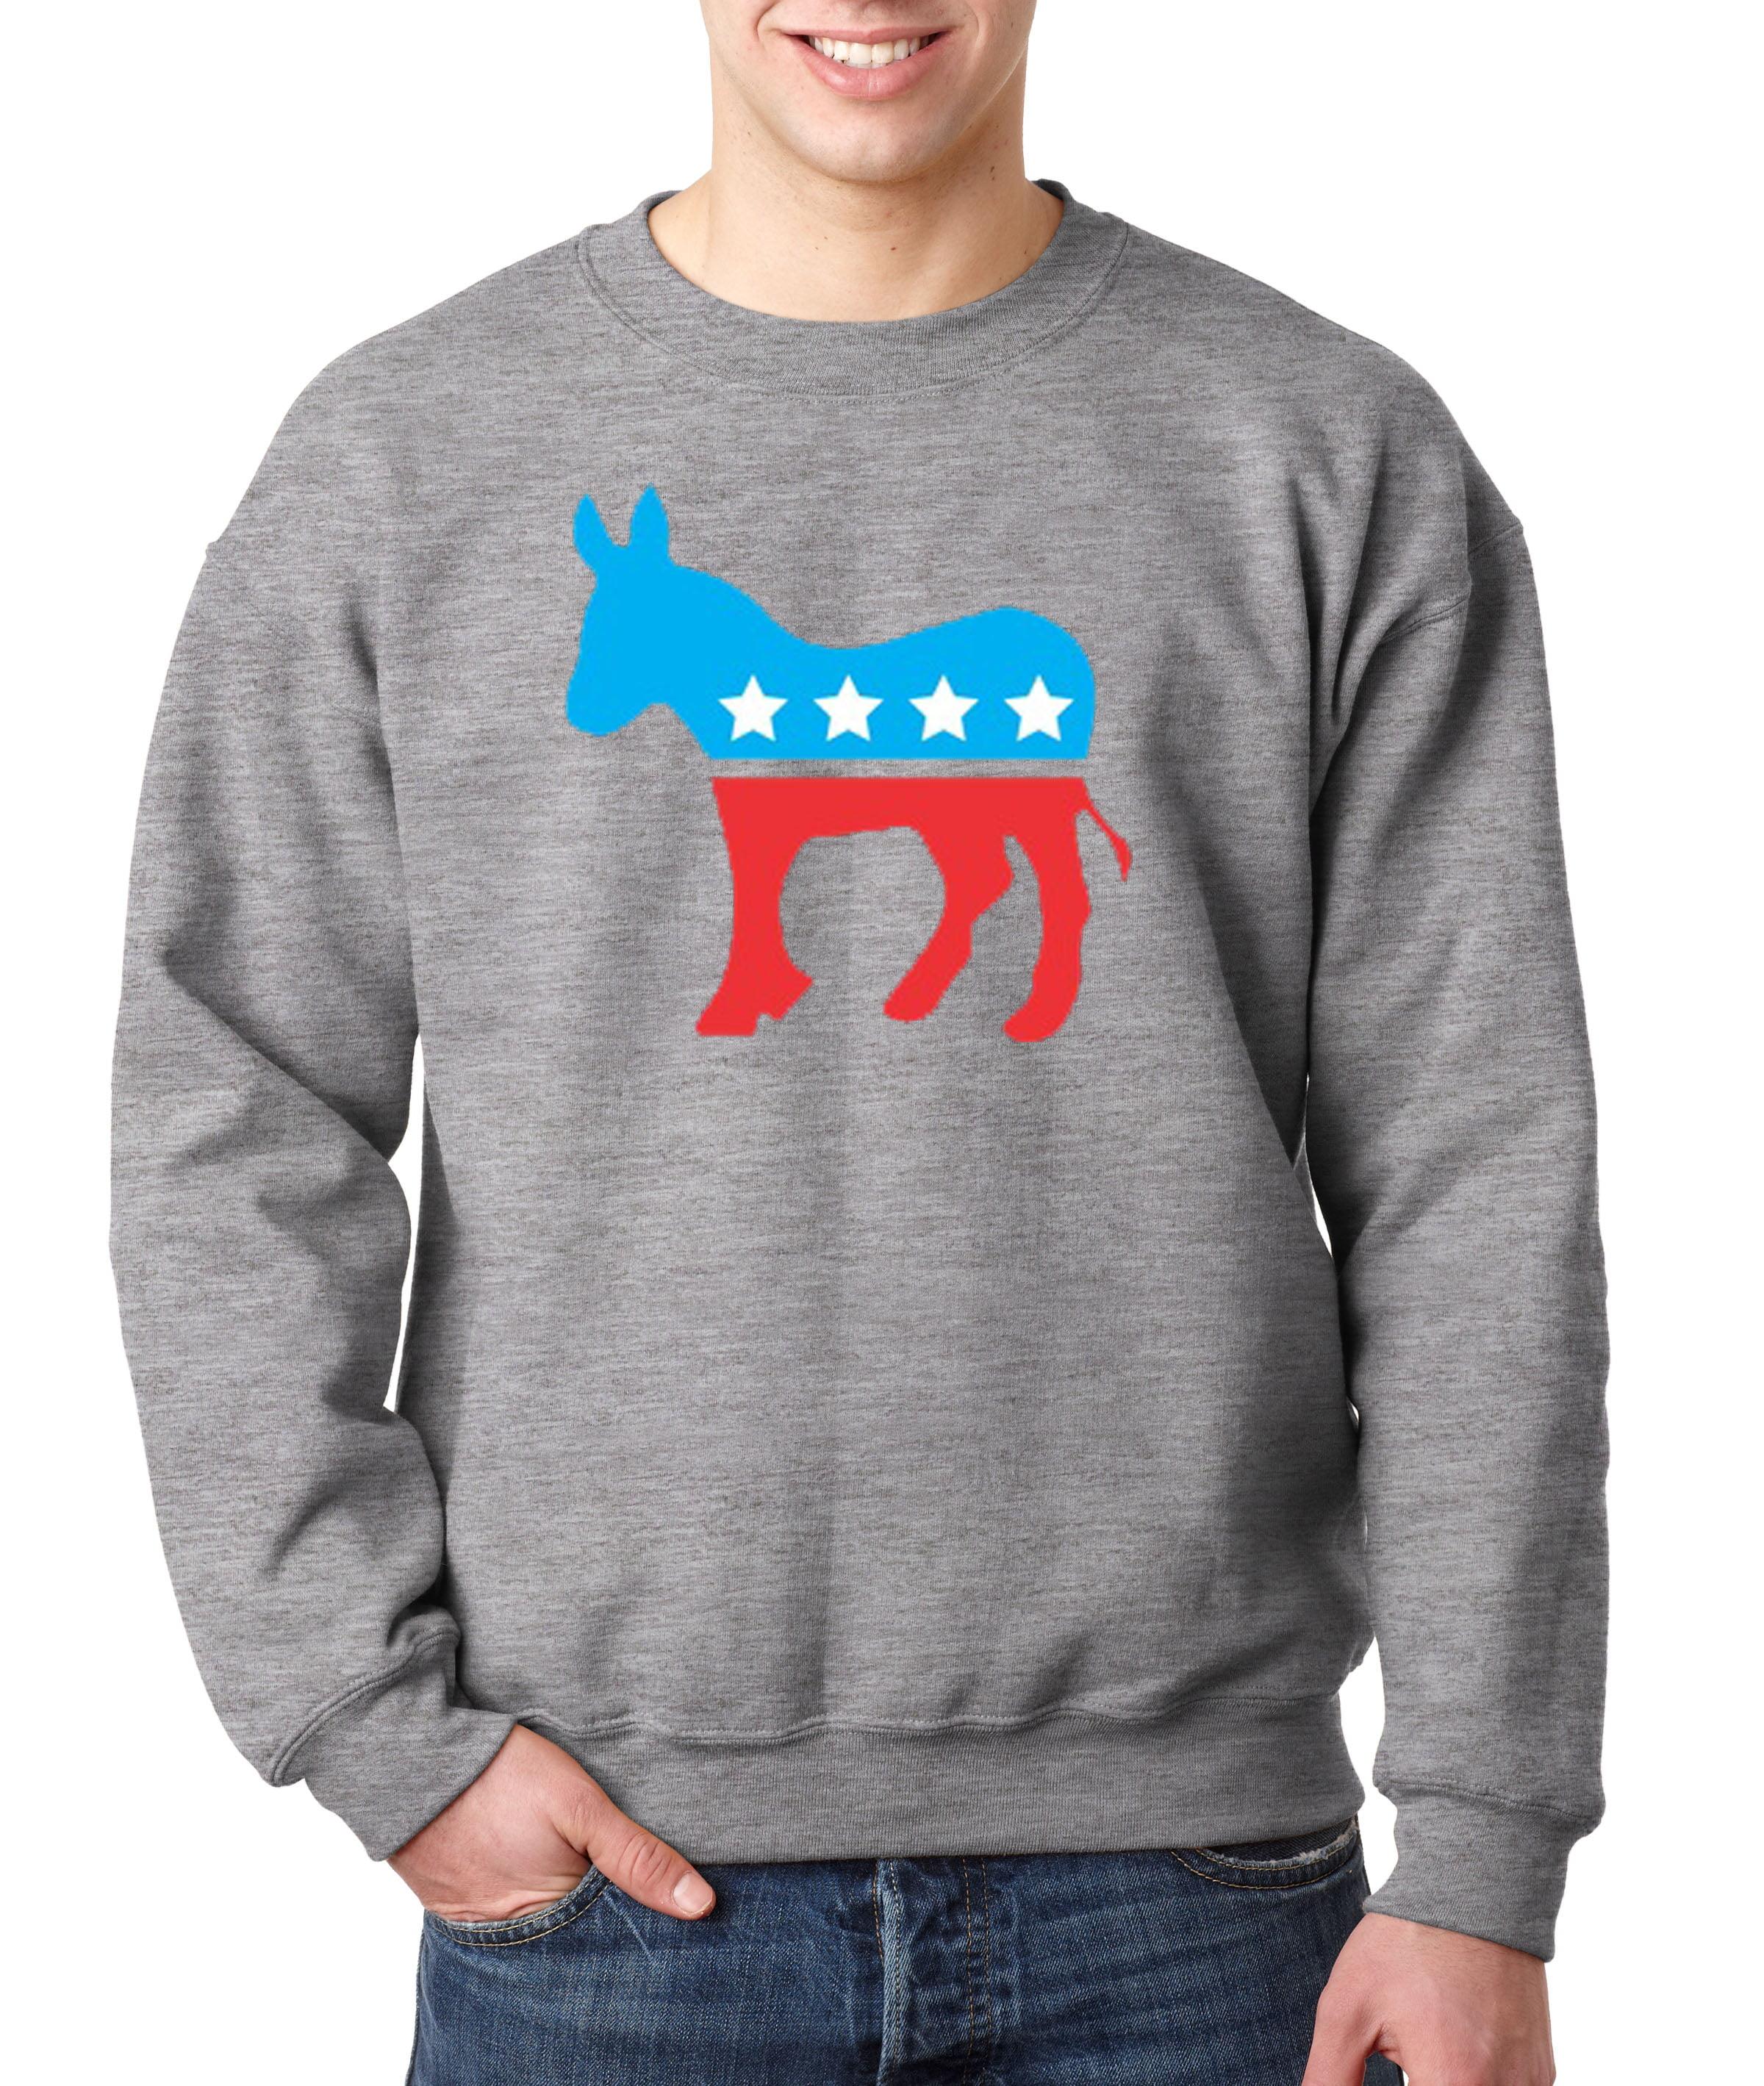 Allwitty 1011 - Crewneck Democrat Donkey Mascot Liberal ...